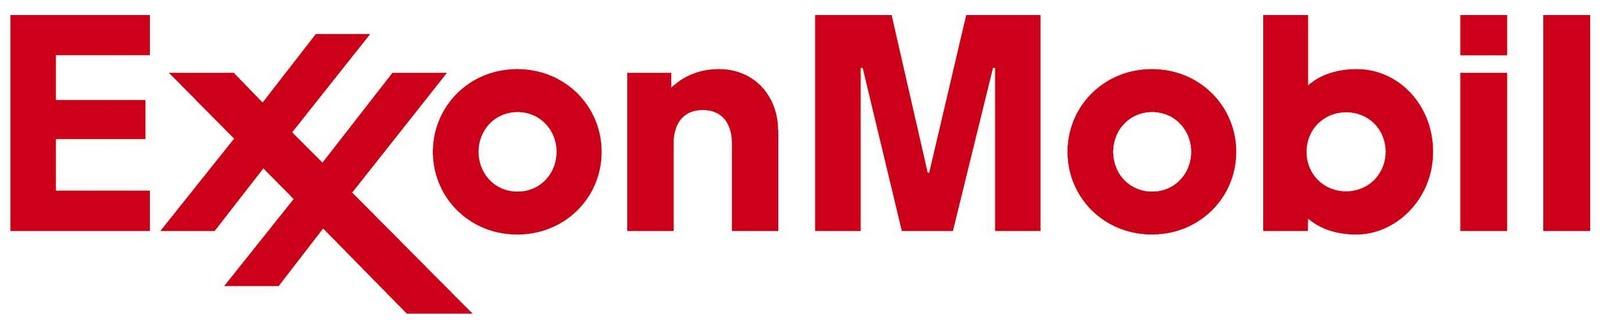 Me newswire exxonmobil foundation marks world malaria day for Mobil logo